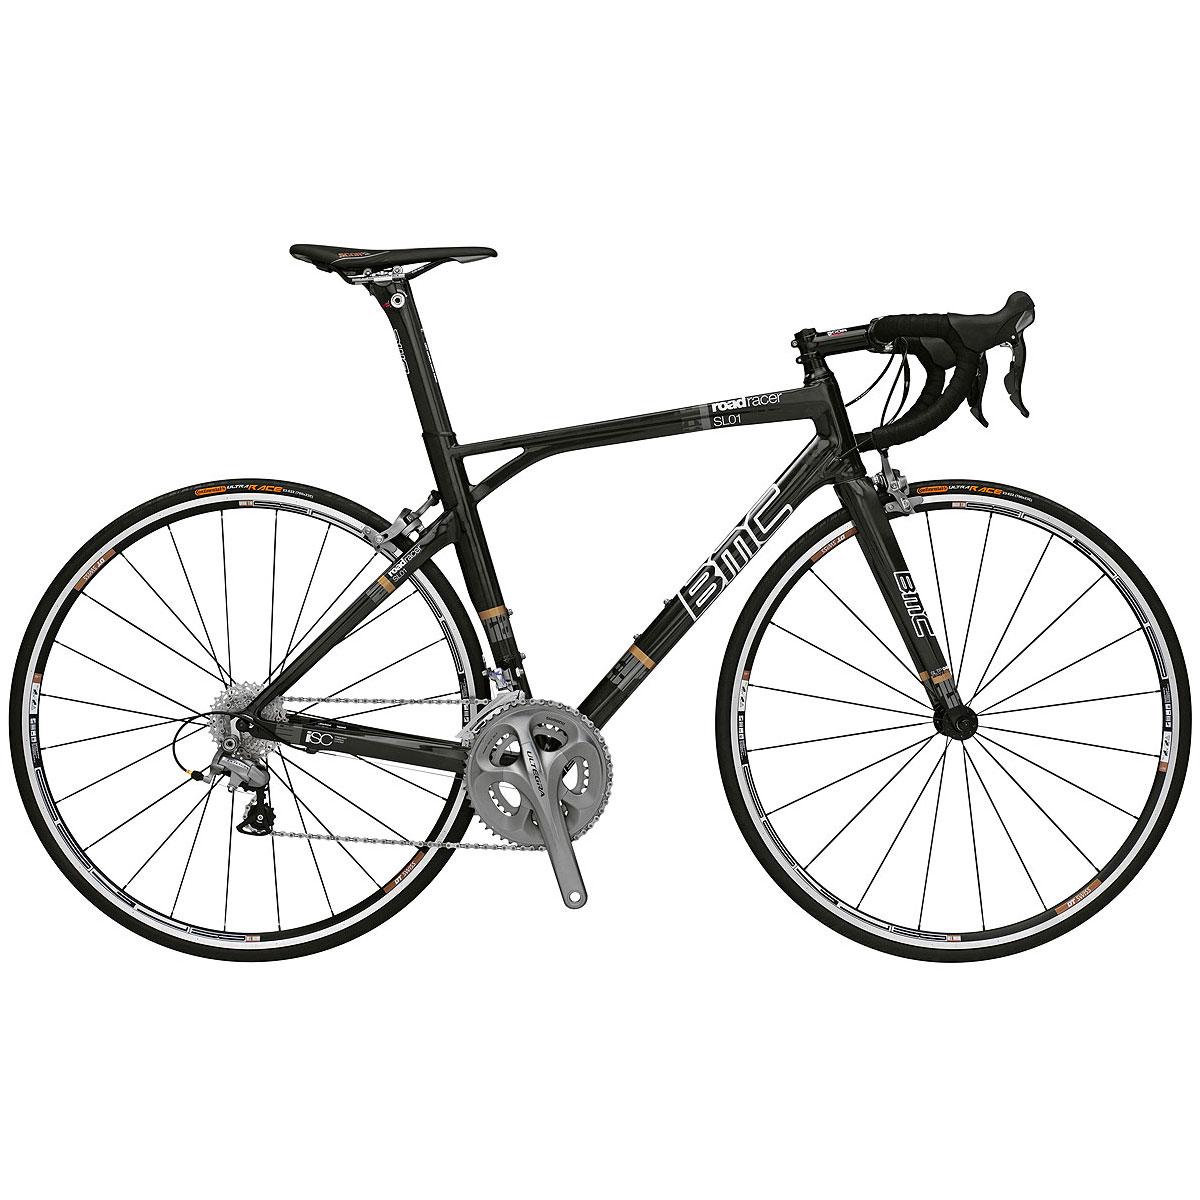 Bicicleta BMC Roadracer SL01 - aro 28